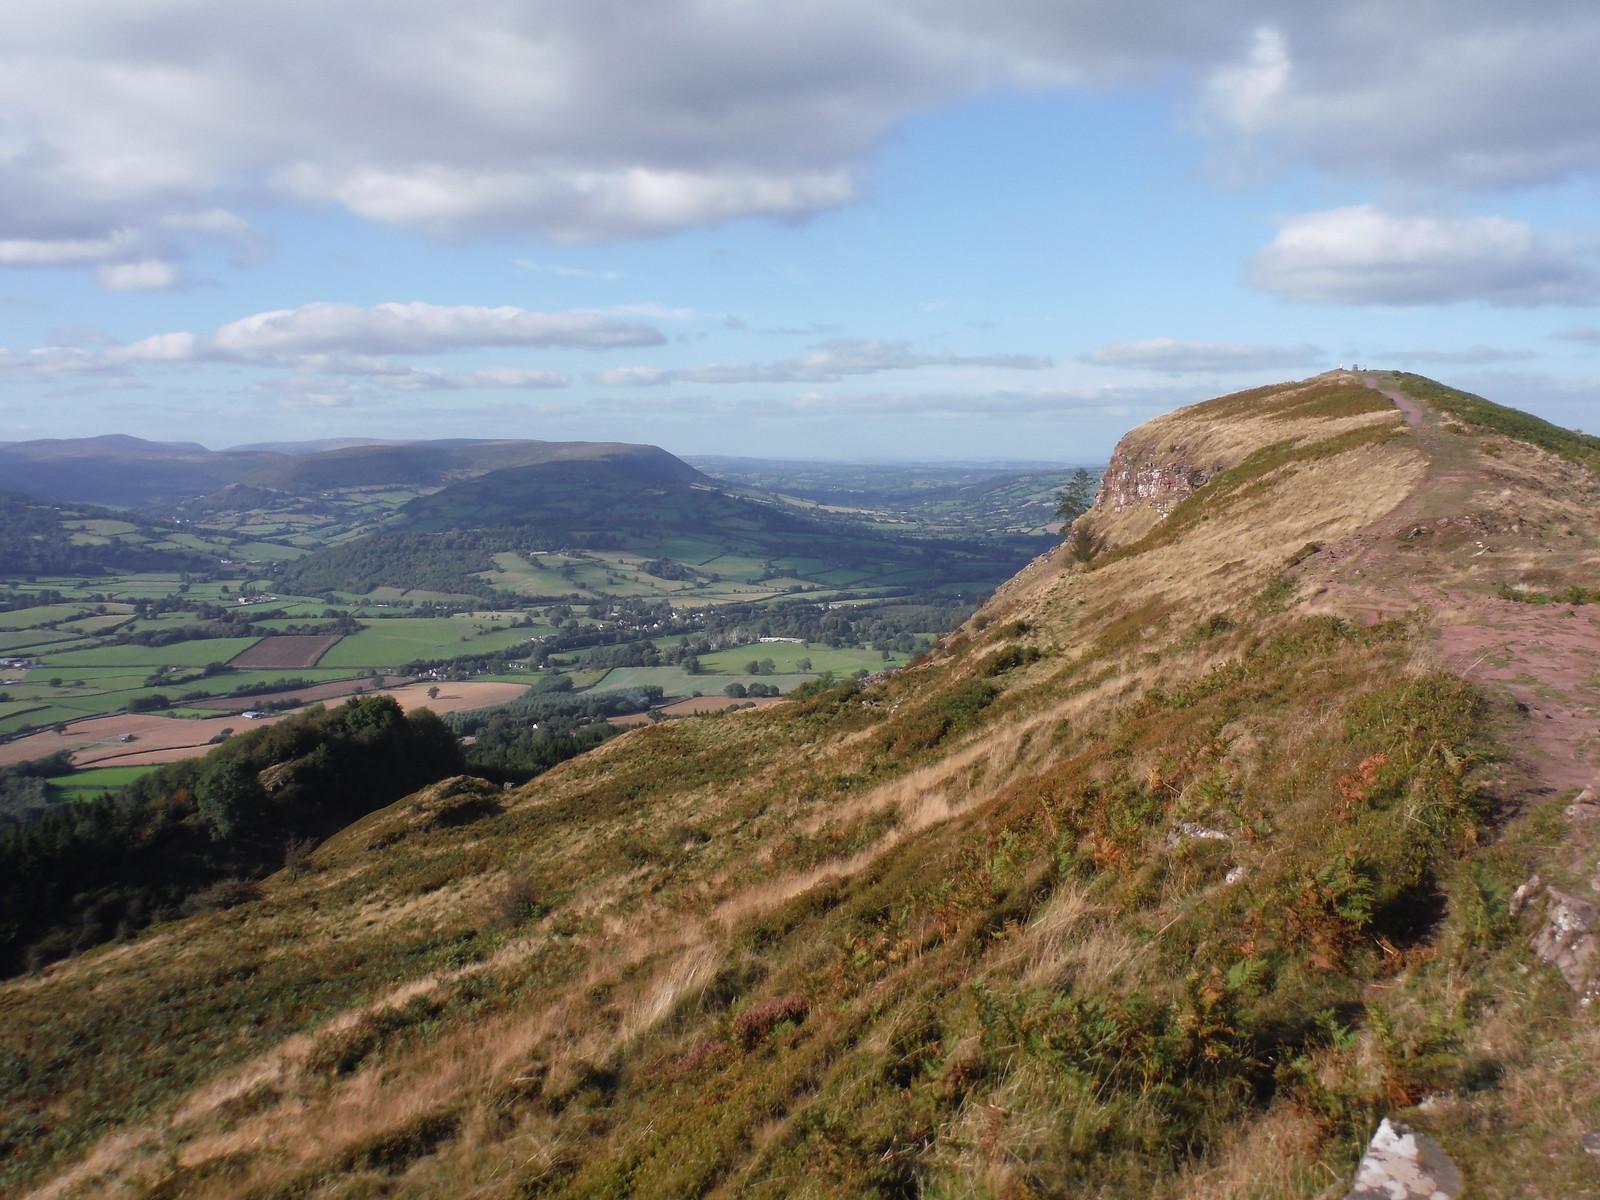 The ridge of The Skirrid and Hatterrall Hill SWC Walk 347 - Llanvihangel Crucorney Circular (via Bryn Arw and The Skirrid)